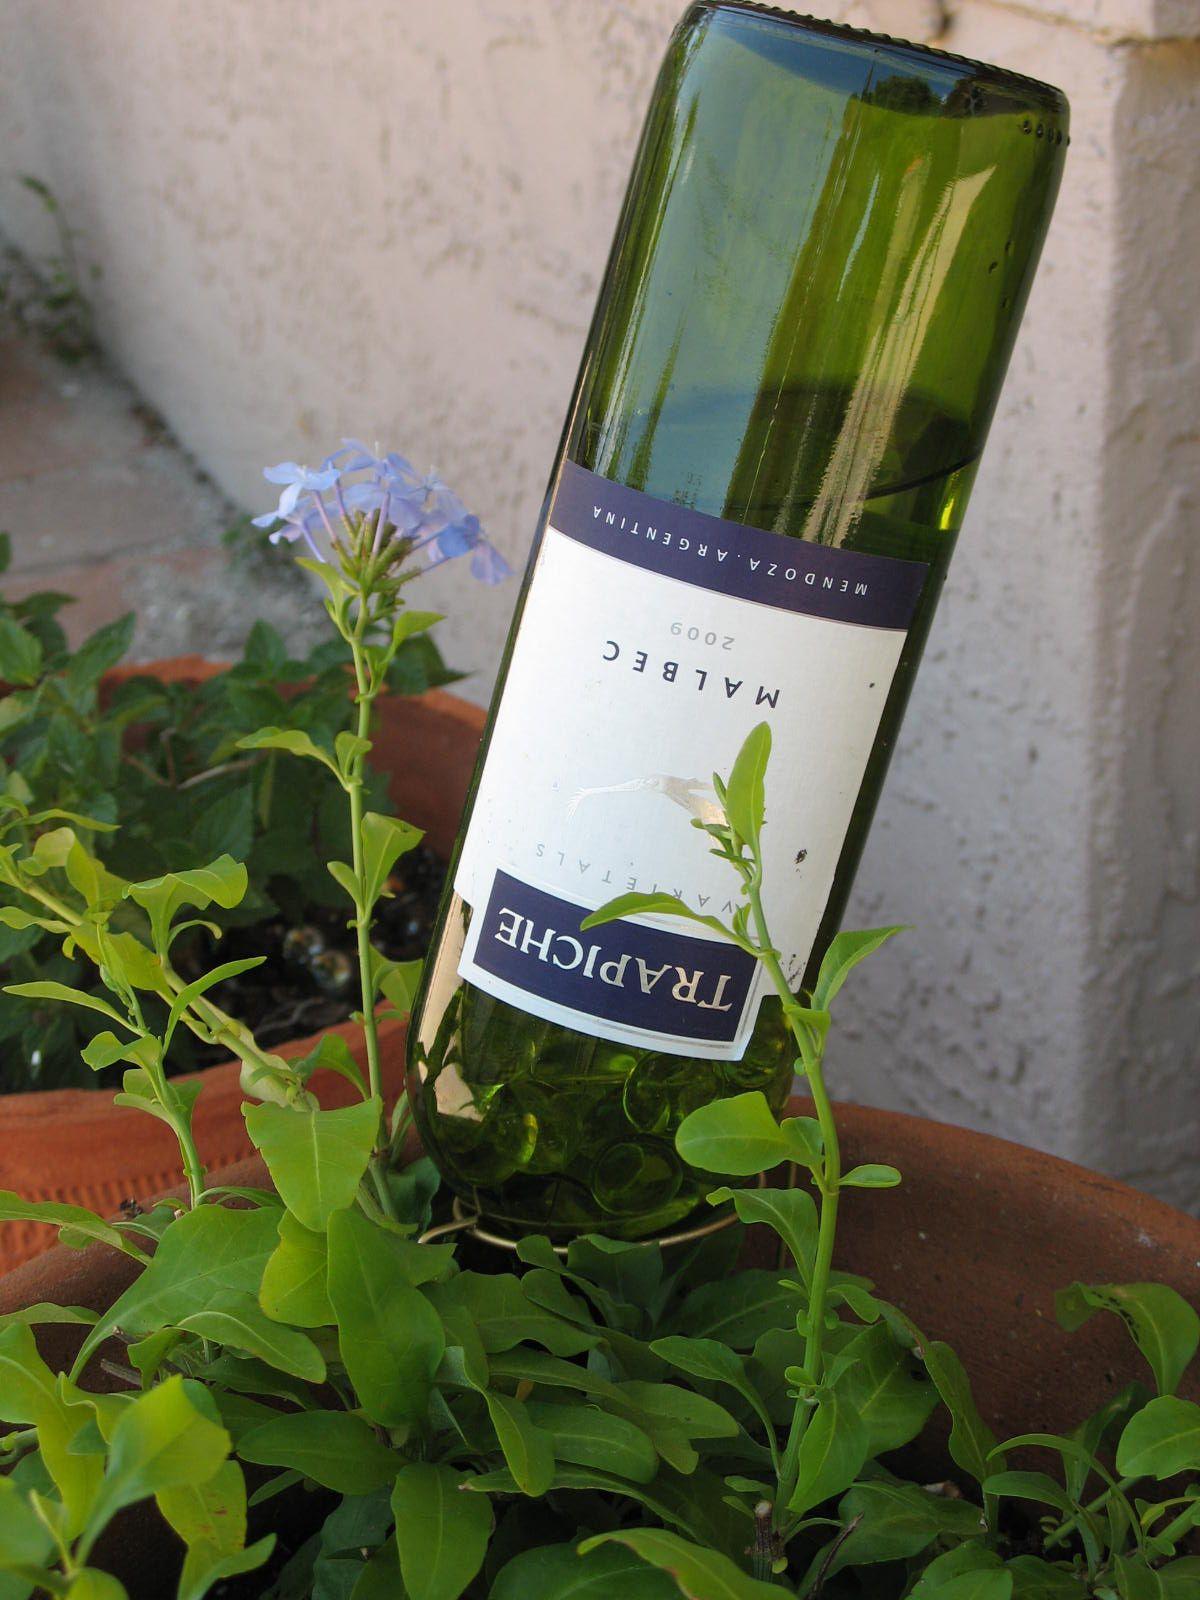 Wine bottle crafts outdoor - 3 Diy Self Watering Ideas For The Garden Water Globesdrink Winewine Bottle